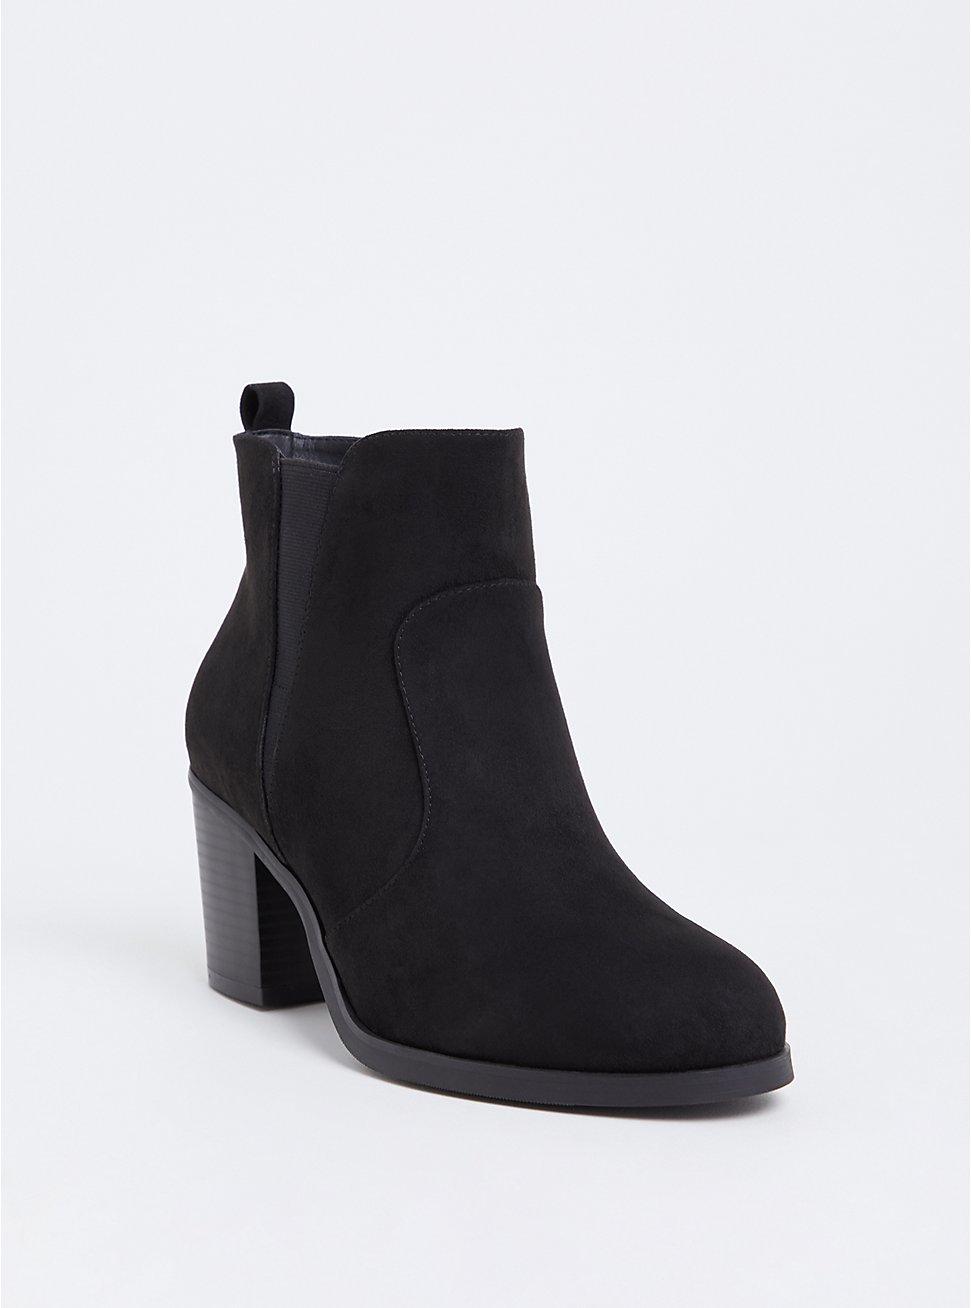 Black Faux Suede Pointed Toe Bootie (WW), BLACK, hi-res